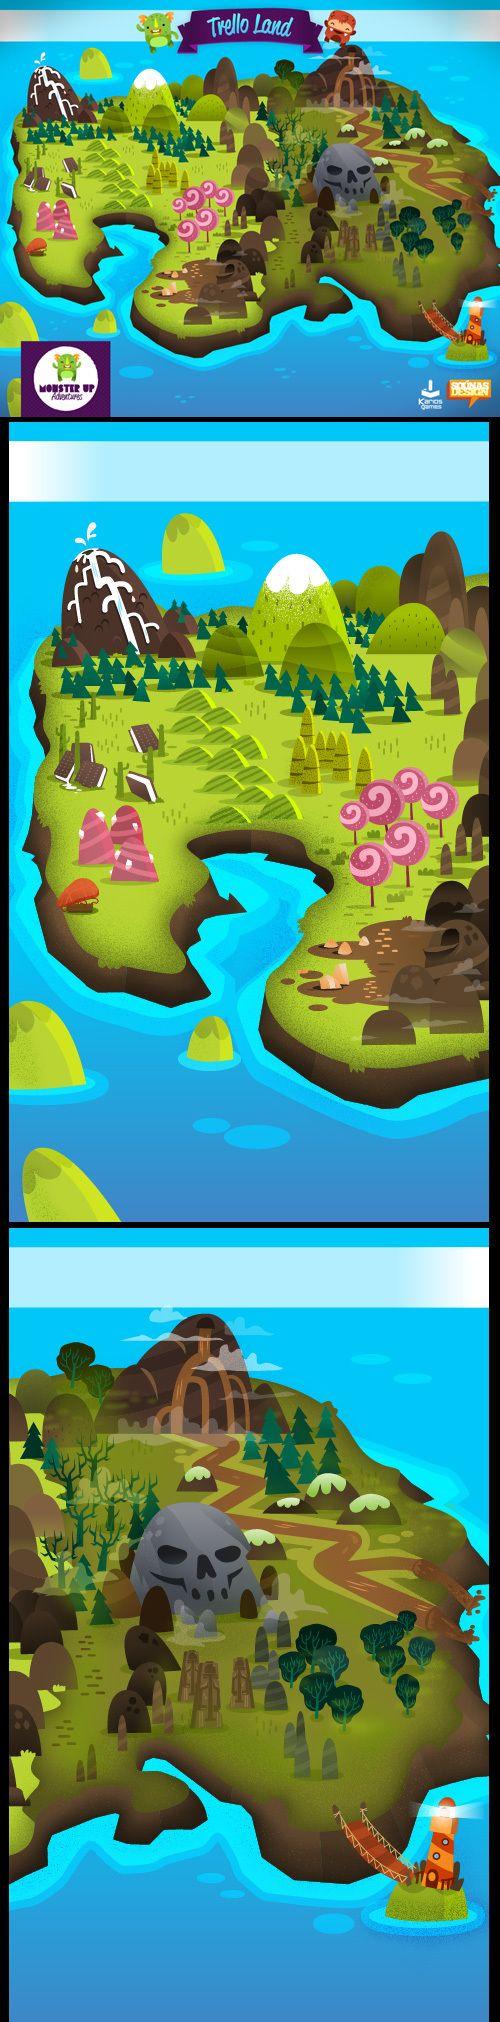 :::MonsterUp Adventures - Game Graphics::: by Ilias Sounas, via Behance